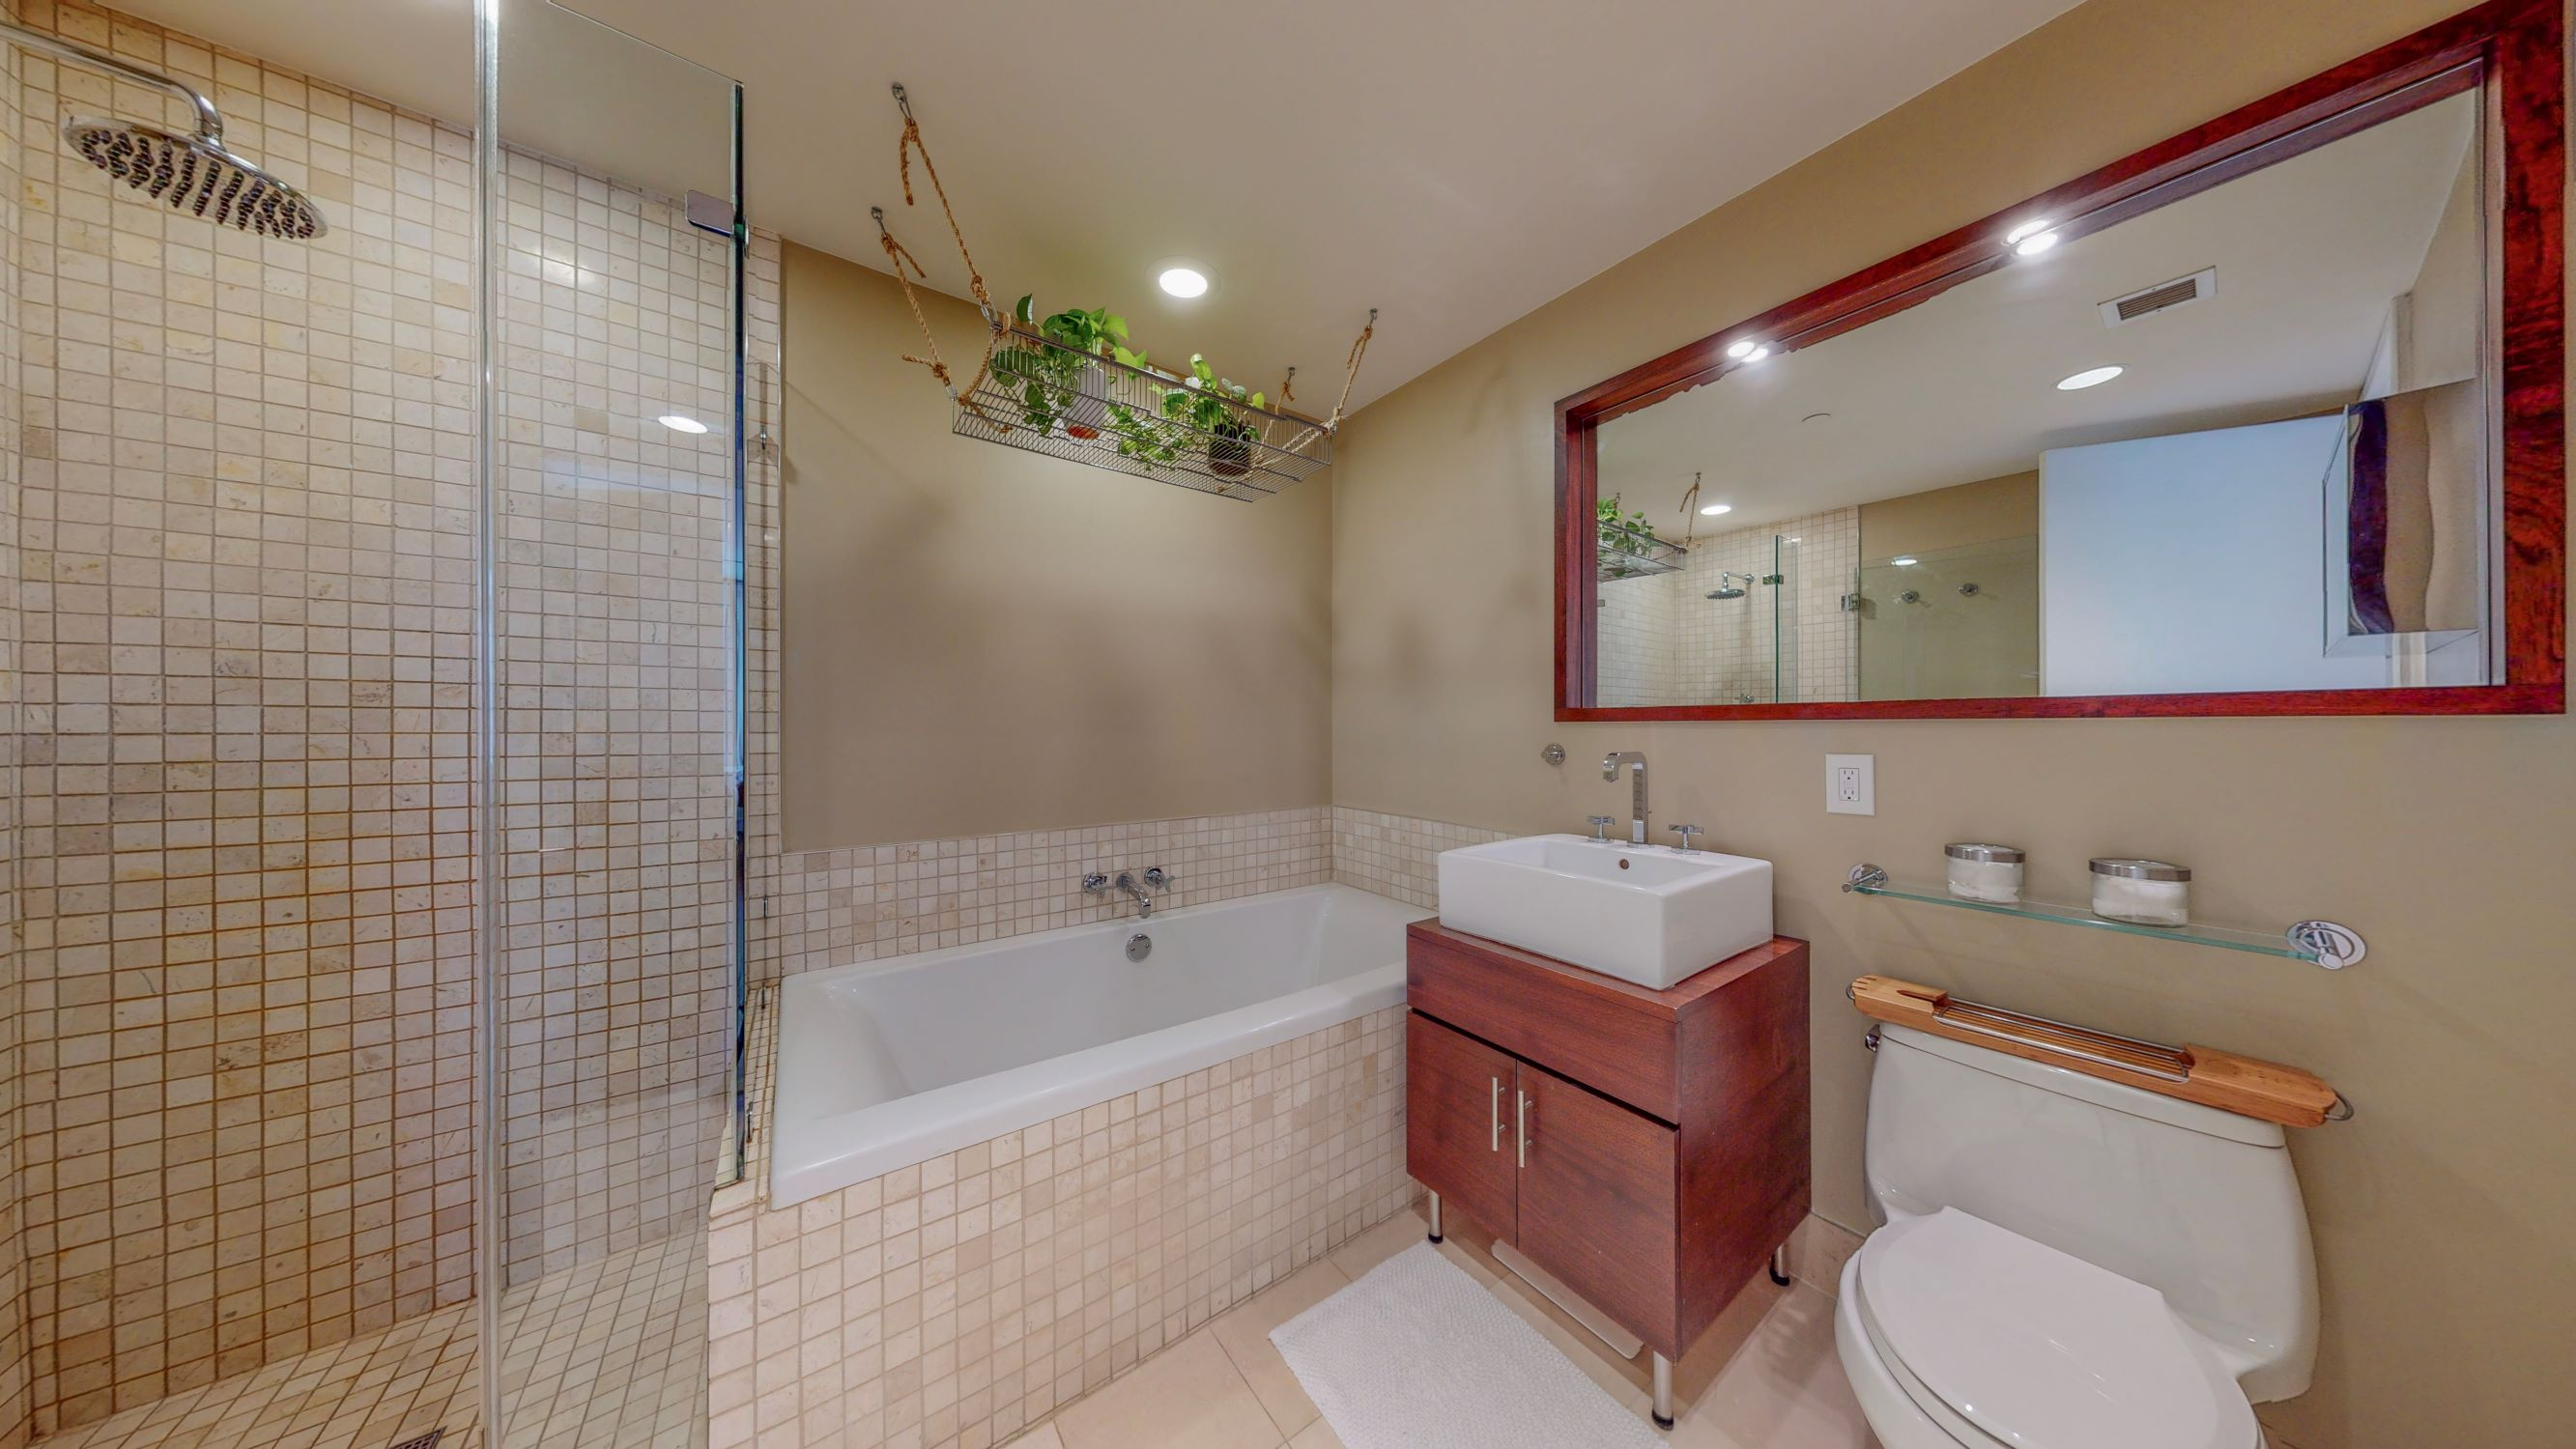 84 Front Street, Brooklyn, Kings, New York, United States 11201, 2 Bedrooms Bedrooms, ,2 BathroomsBathrooms,Condo,SOLD,The Nexus,Front Street,2,1132